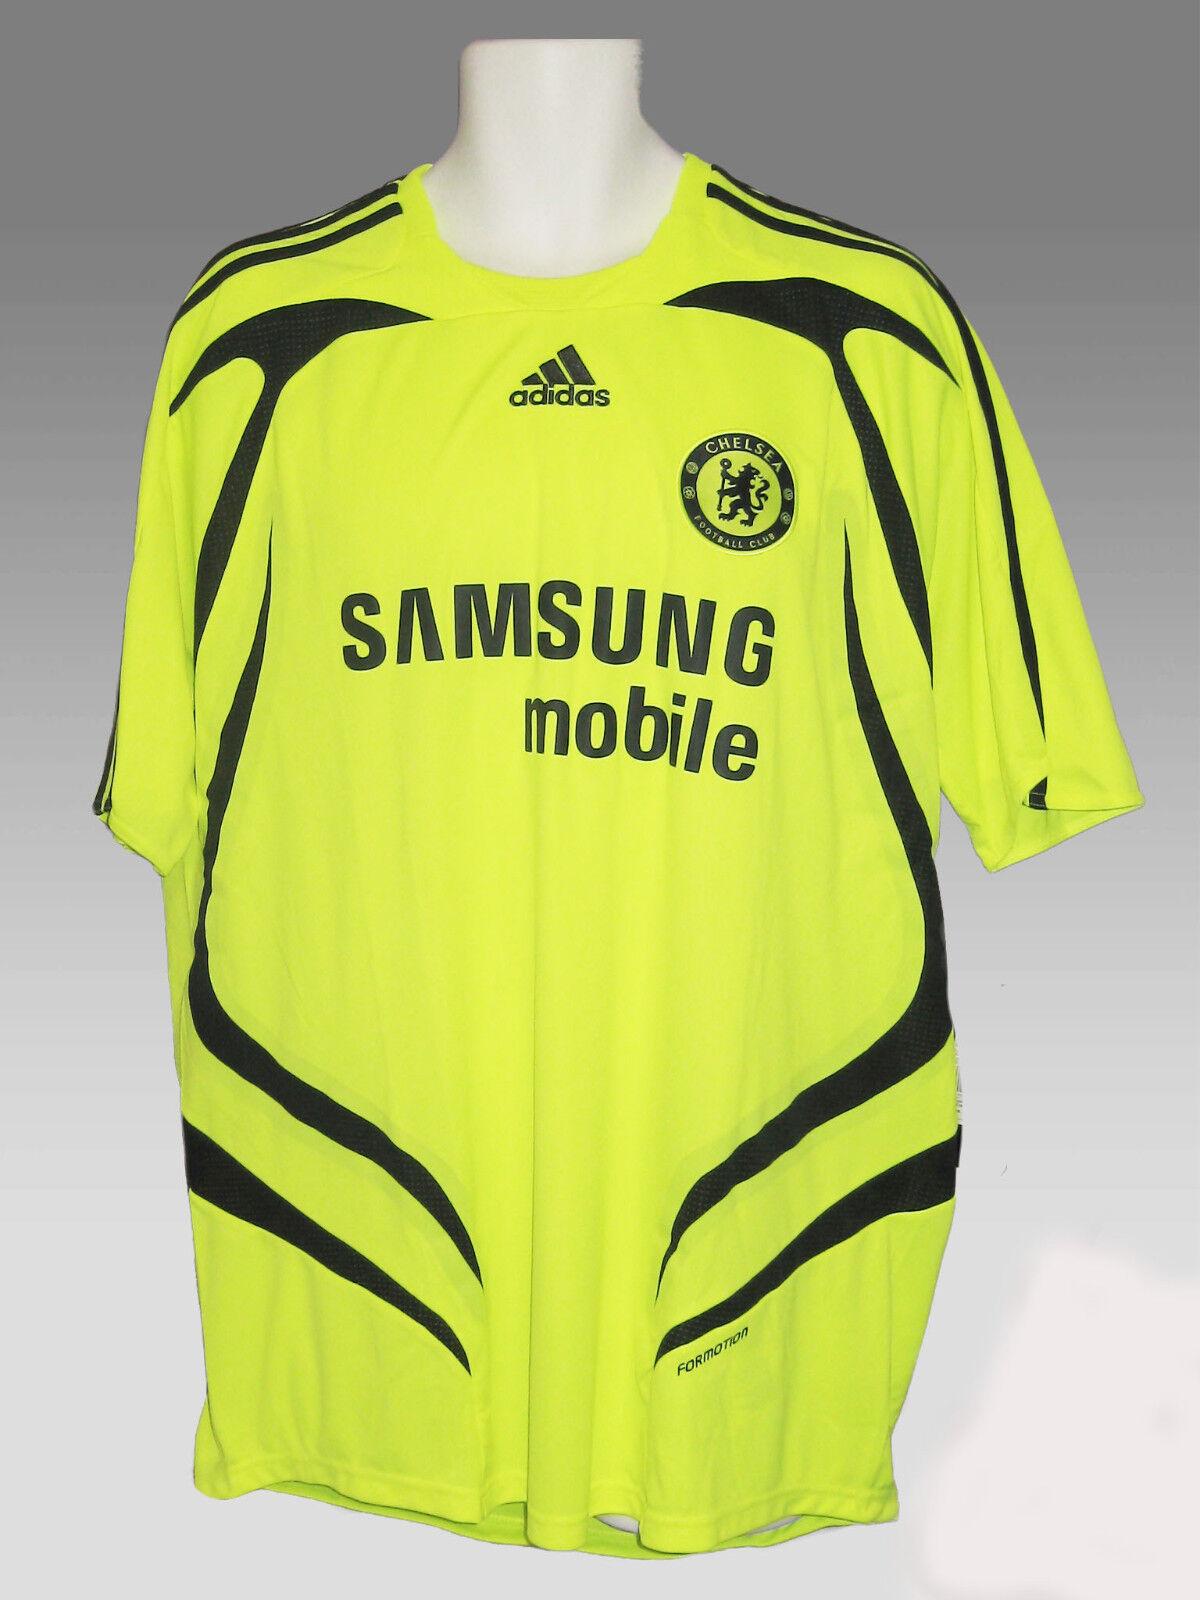 NW Adidas Vintage Chelsea TShirt Calcio Ufficiale Formotion Giallo SManica XL